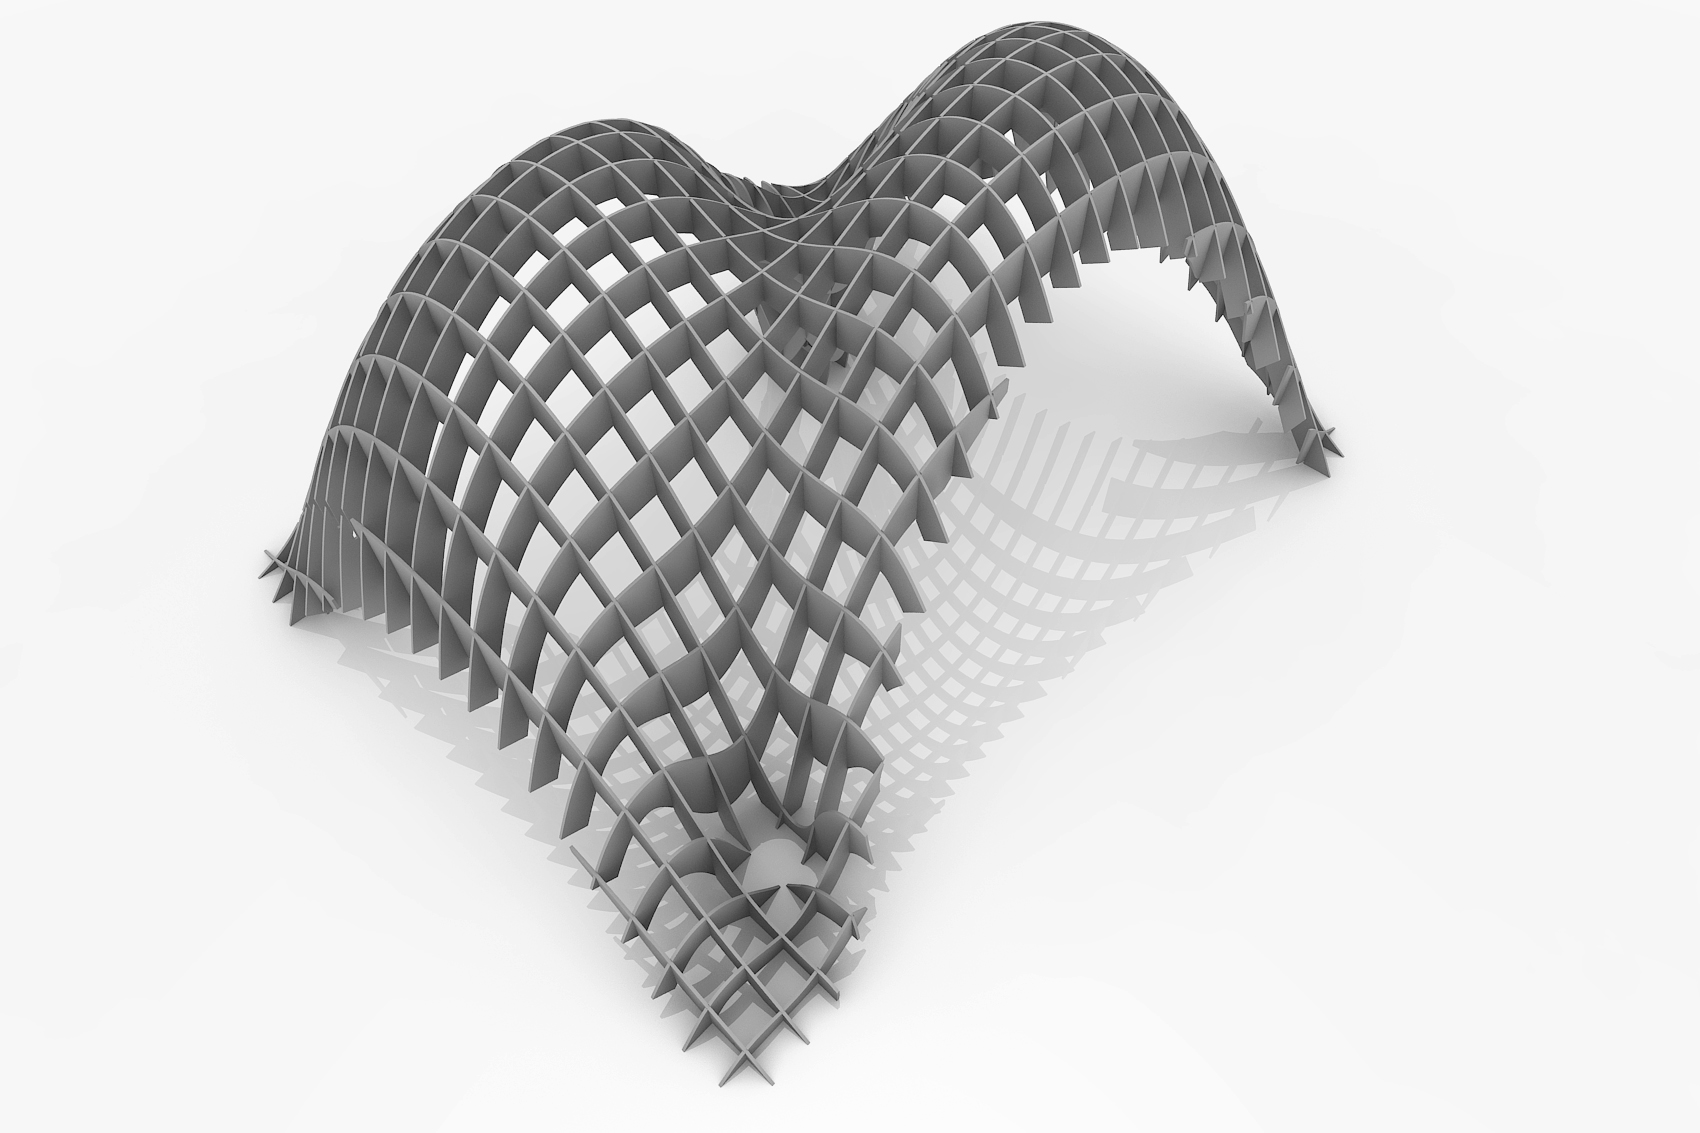 Taller de dise o param trico y fabricaci n digital cidi for Arquitectura parametrica pdf